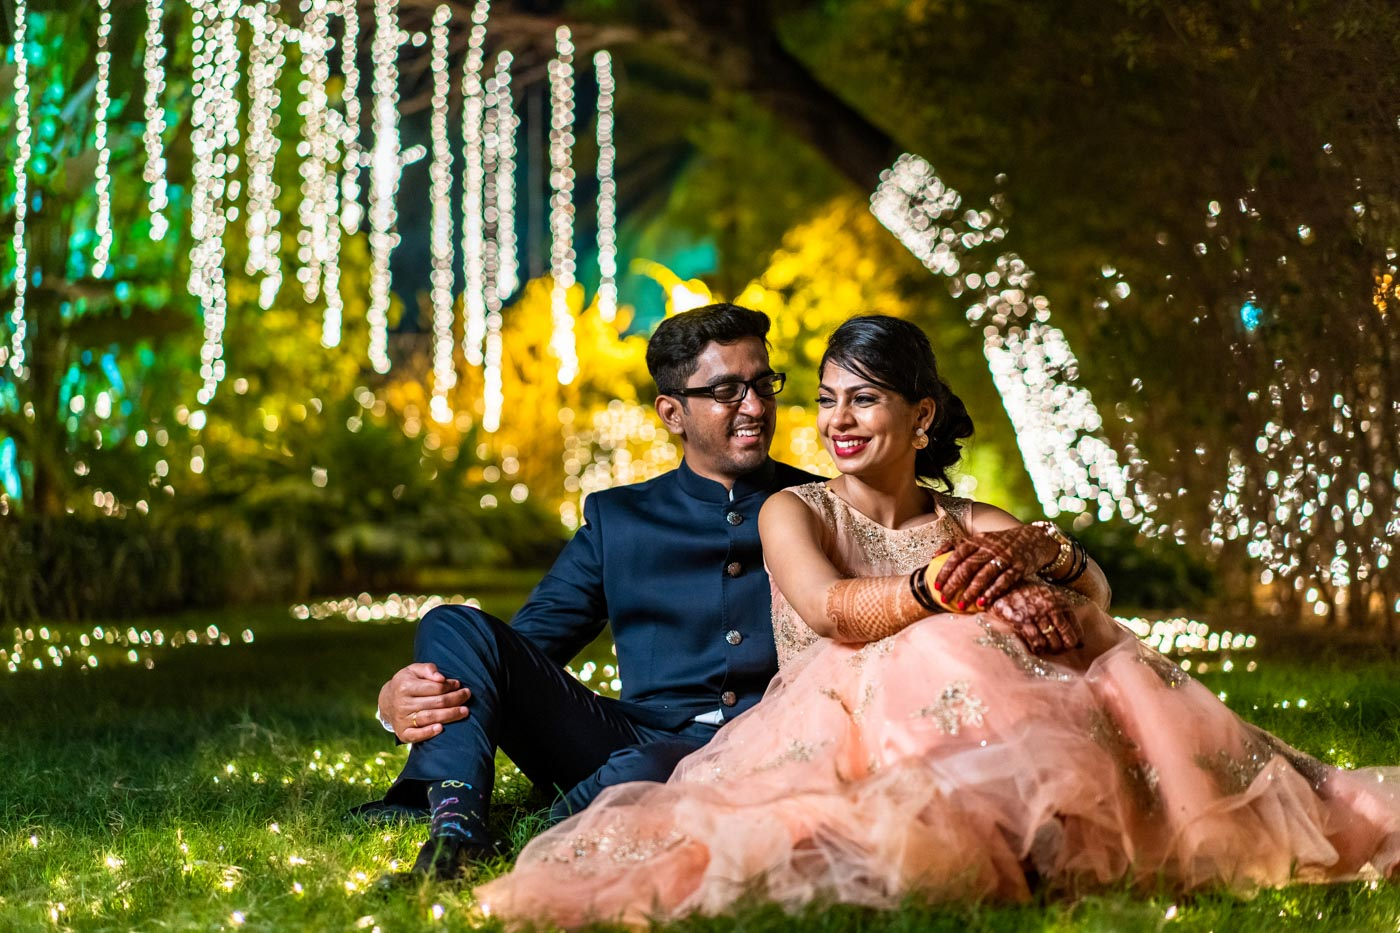 Modini & Nishanth - Outdoor Tamil Wedding @ Elements